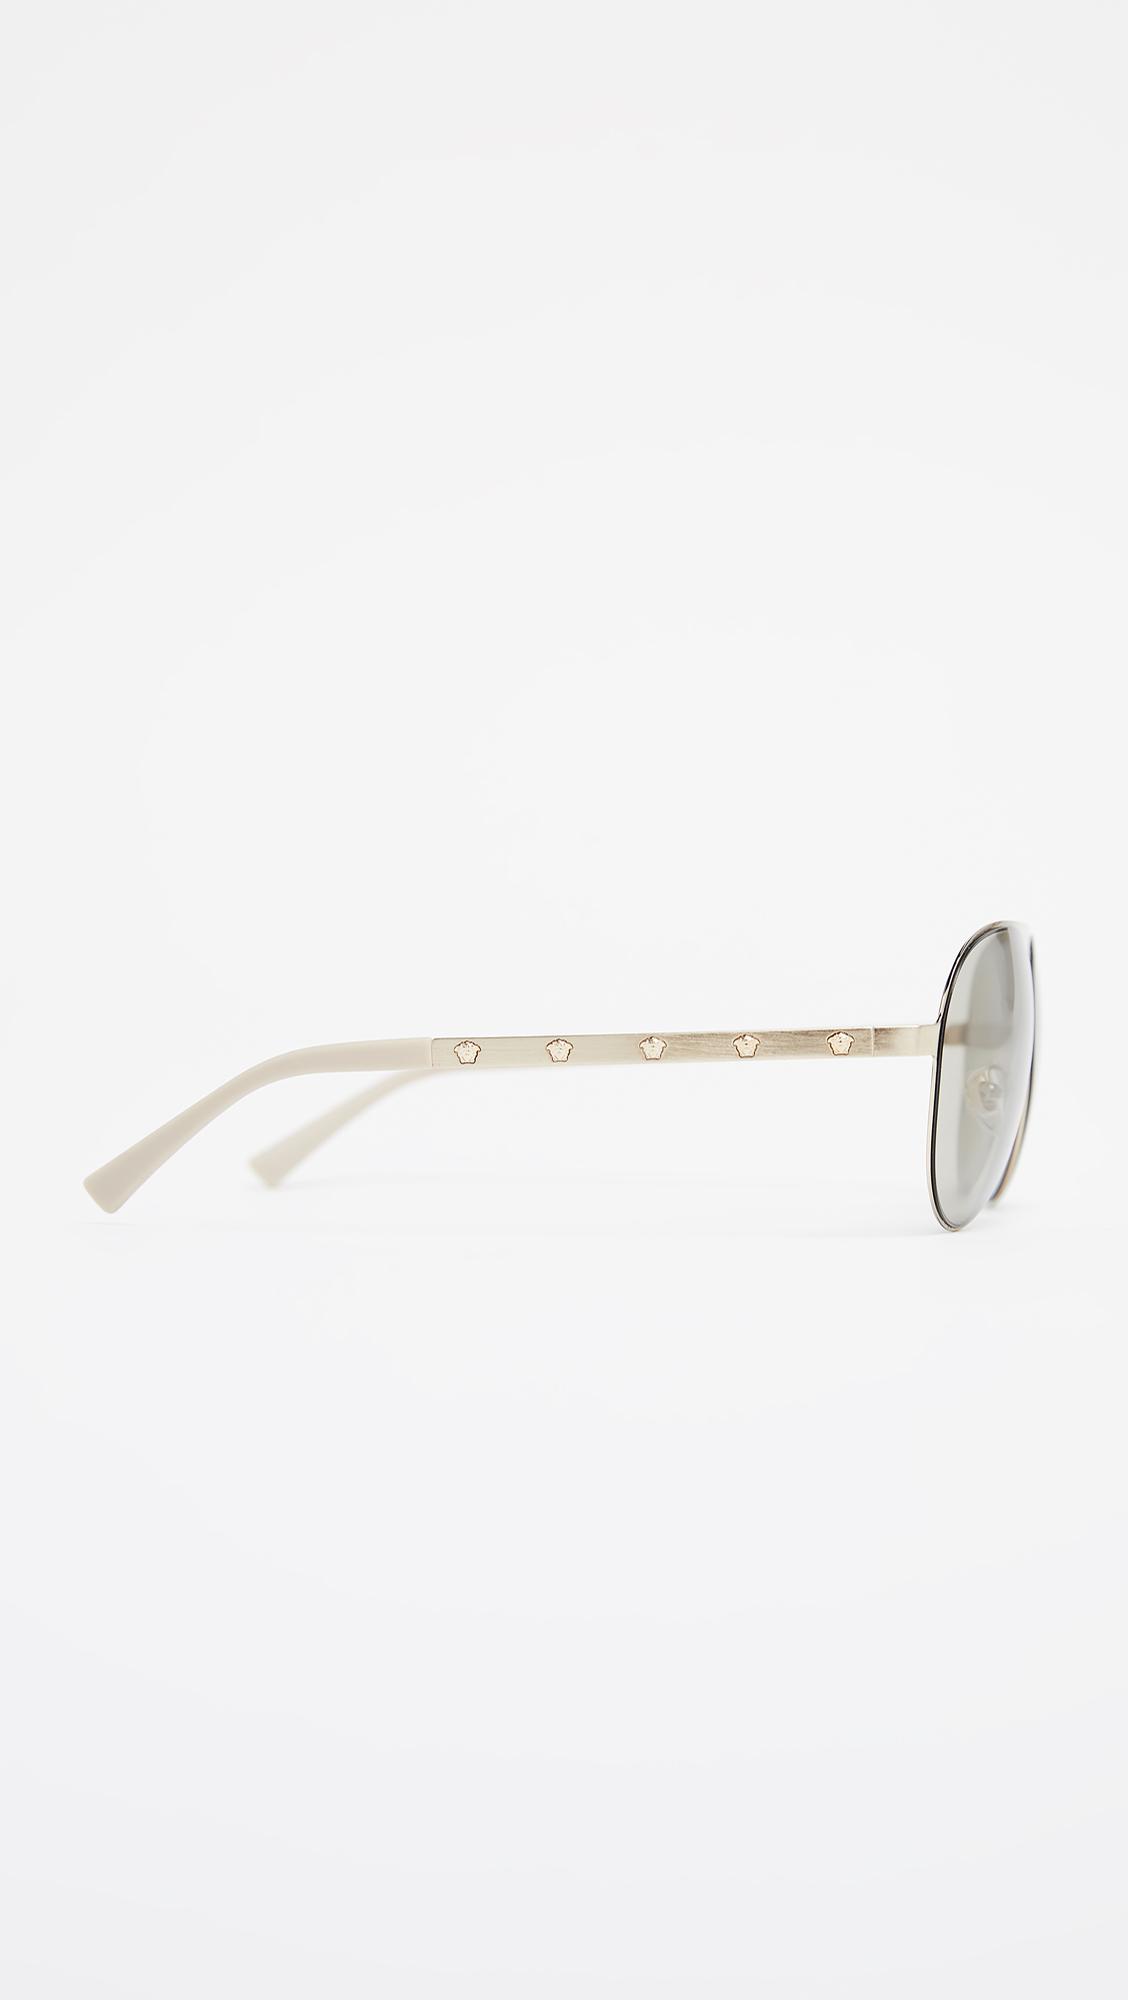 dc8e38eae16 Versace Medusina Pilot Sunglasses